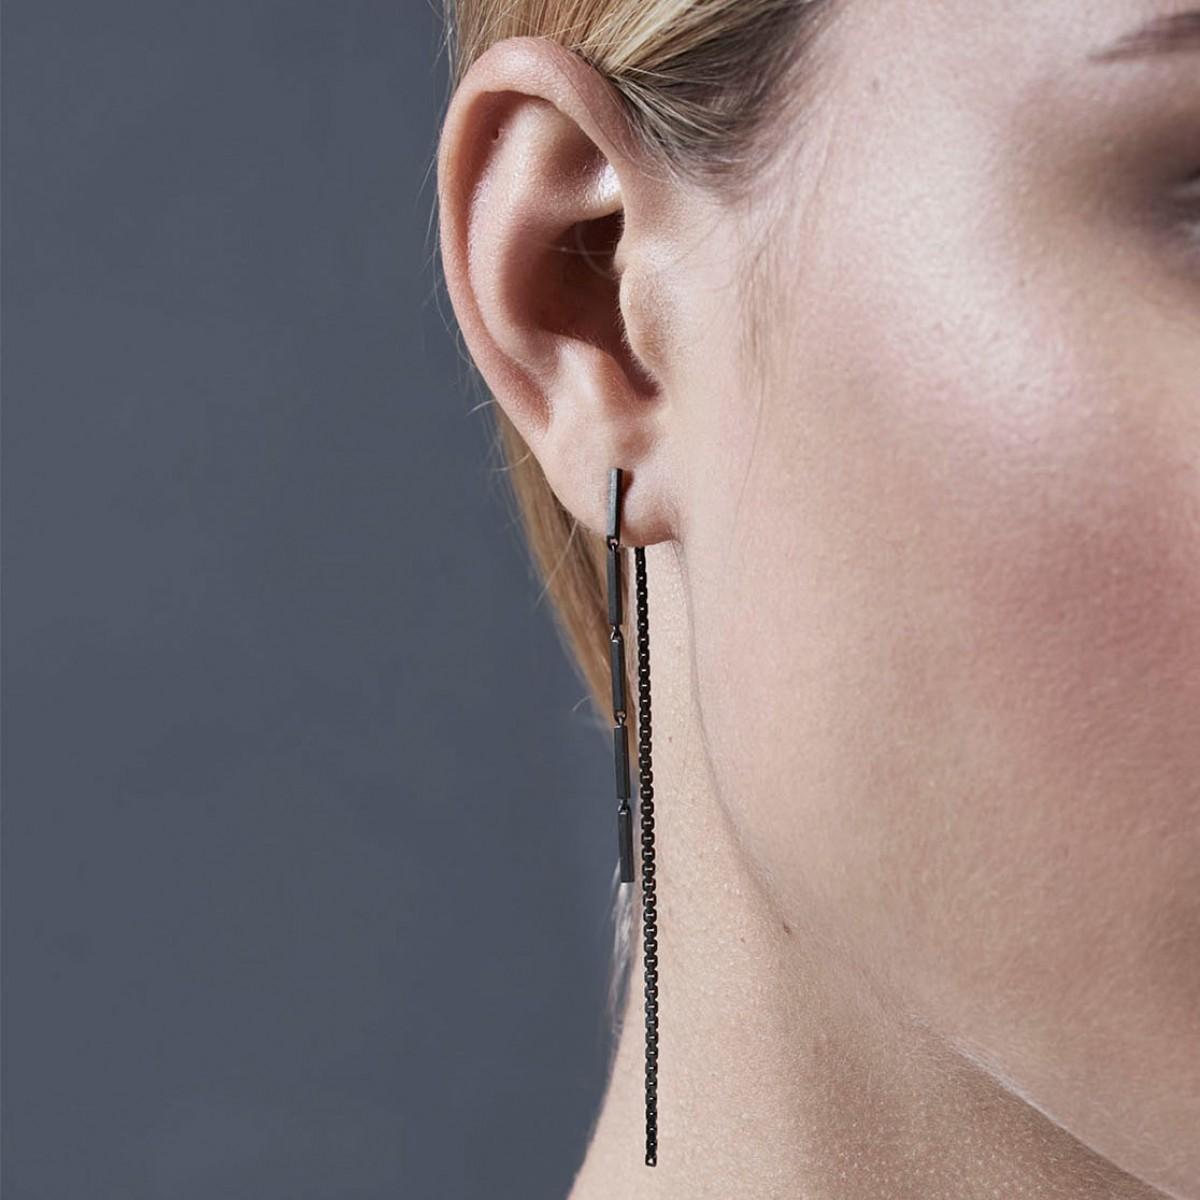 Jasmina Jovy Jewellery Hidden Faces Ohrringe EAHF01 black rhodium